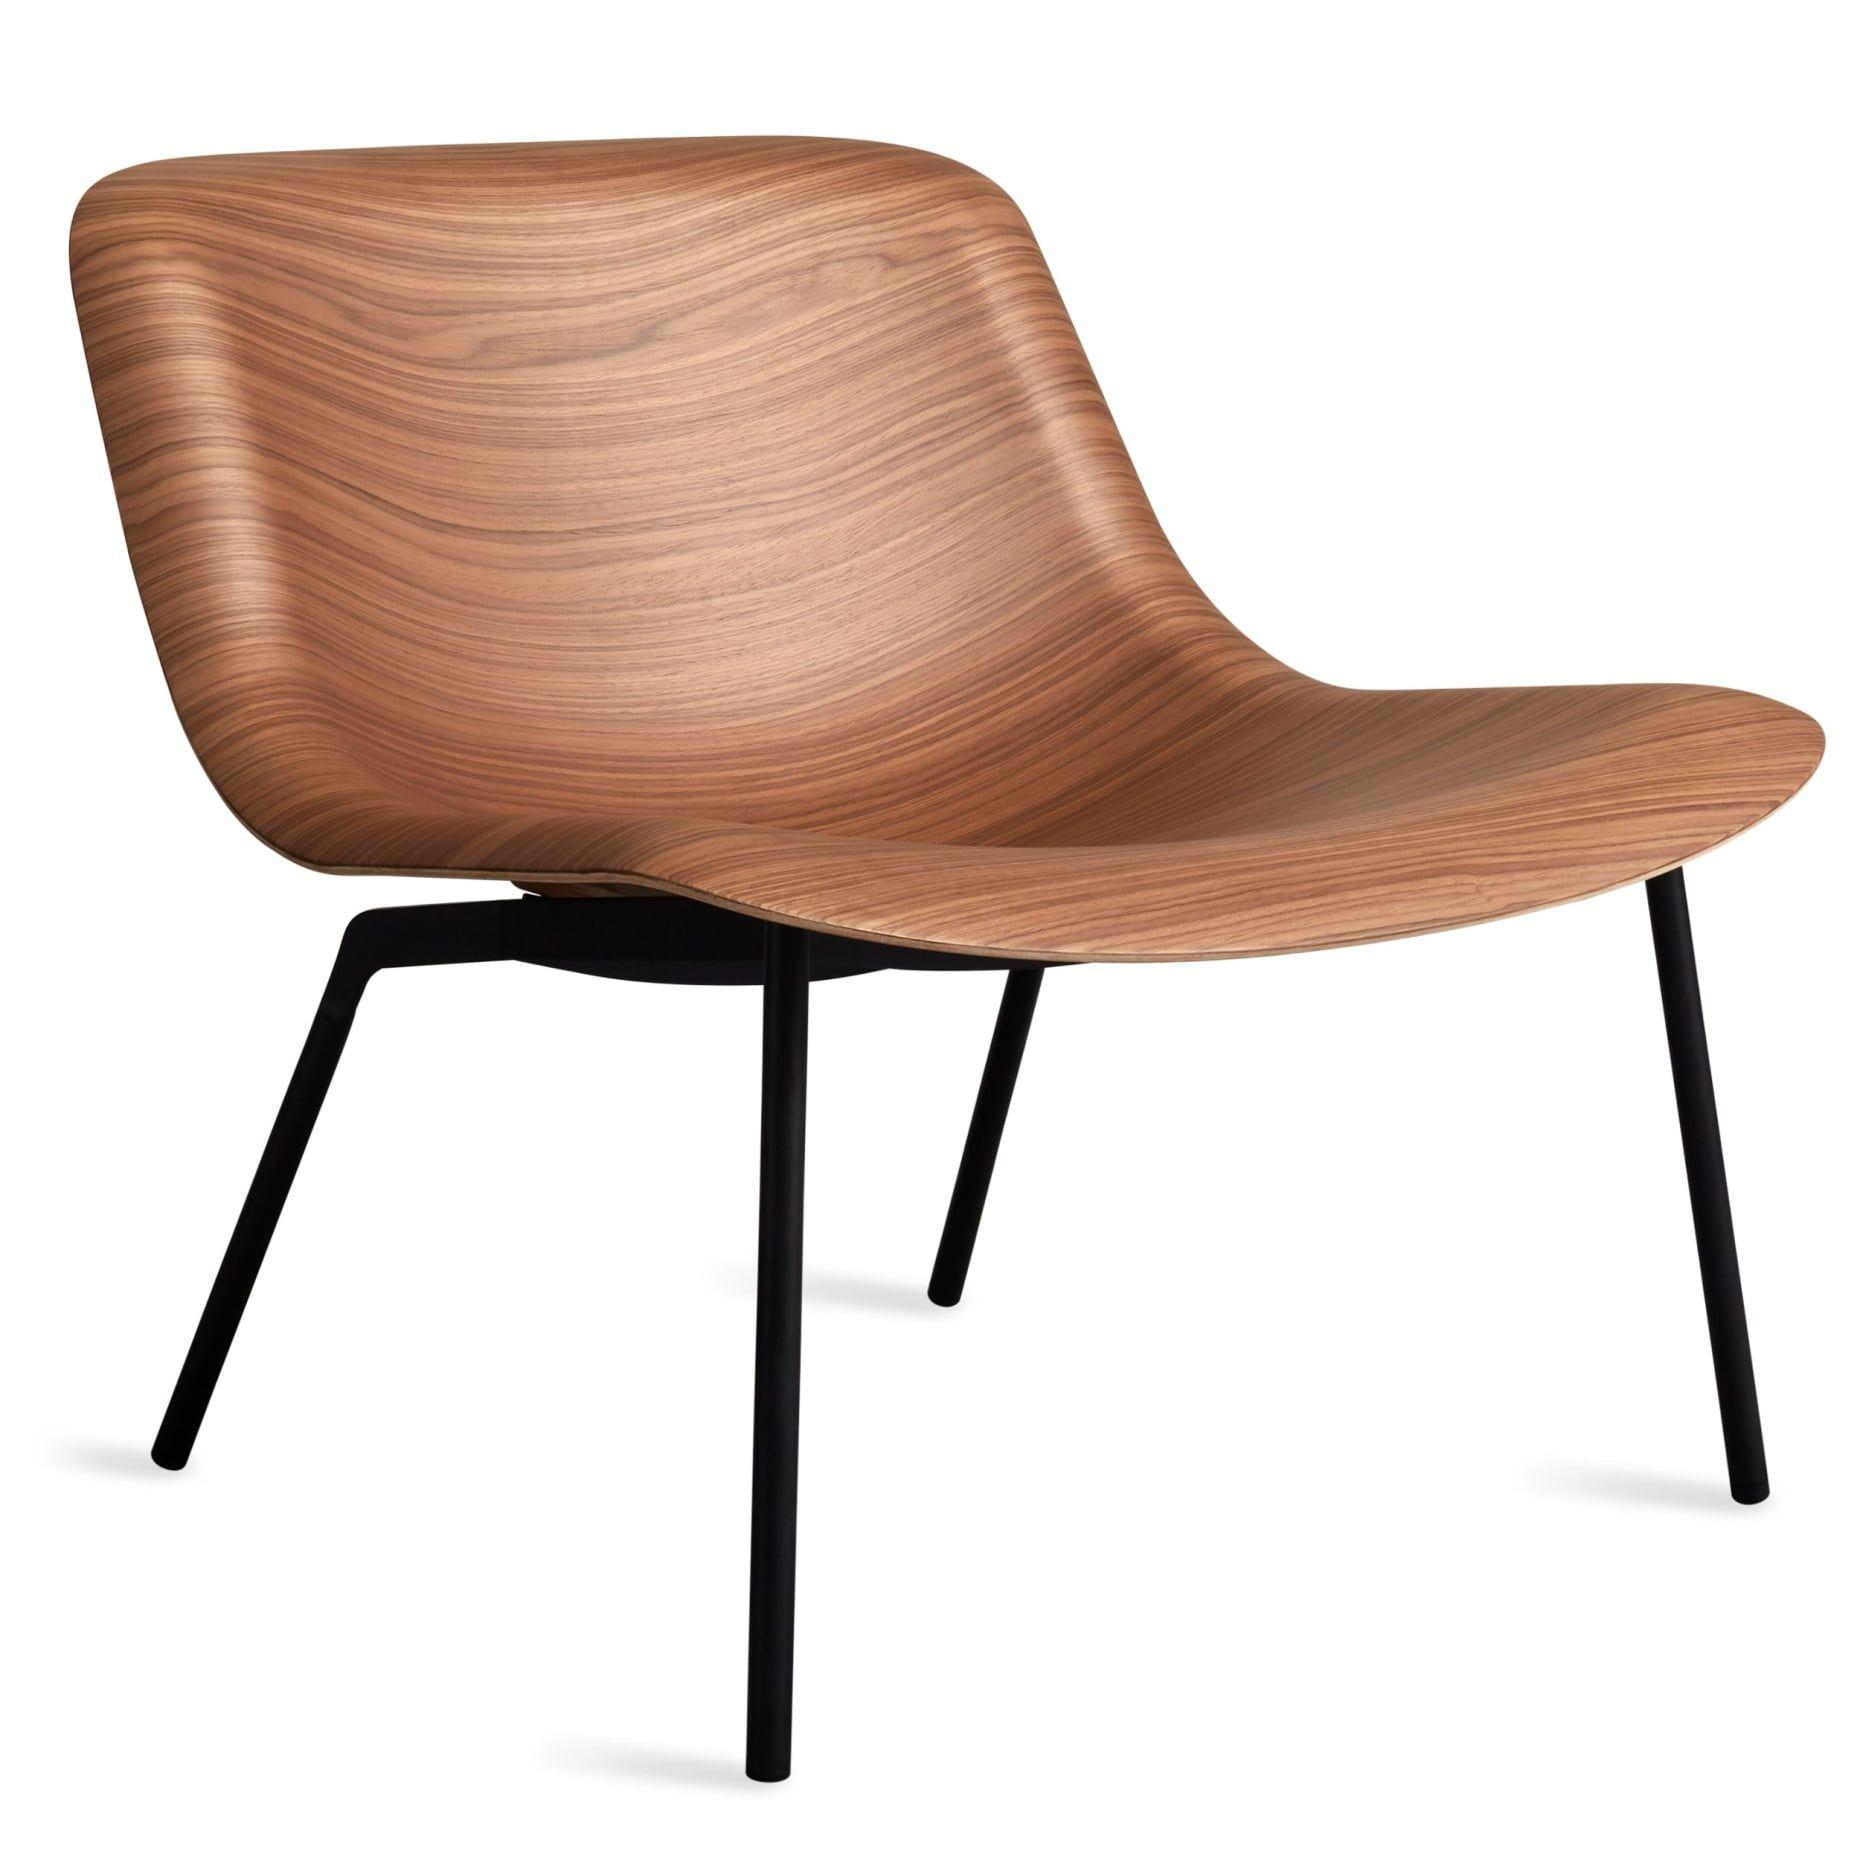 Brilliant Nonesuch Lounge Chair Walnut Furnitureand Lamps Creativecarmelina Interior Chair Design Creativecarmelinacom